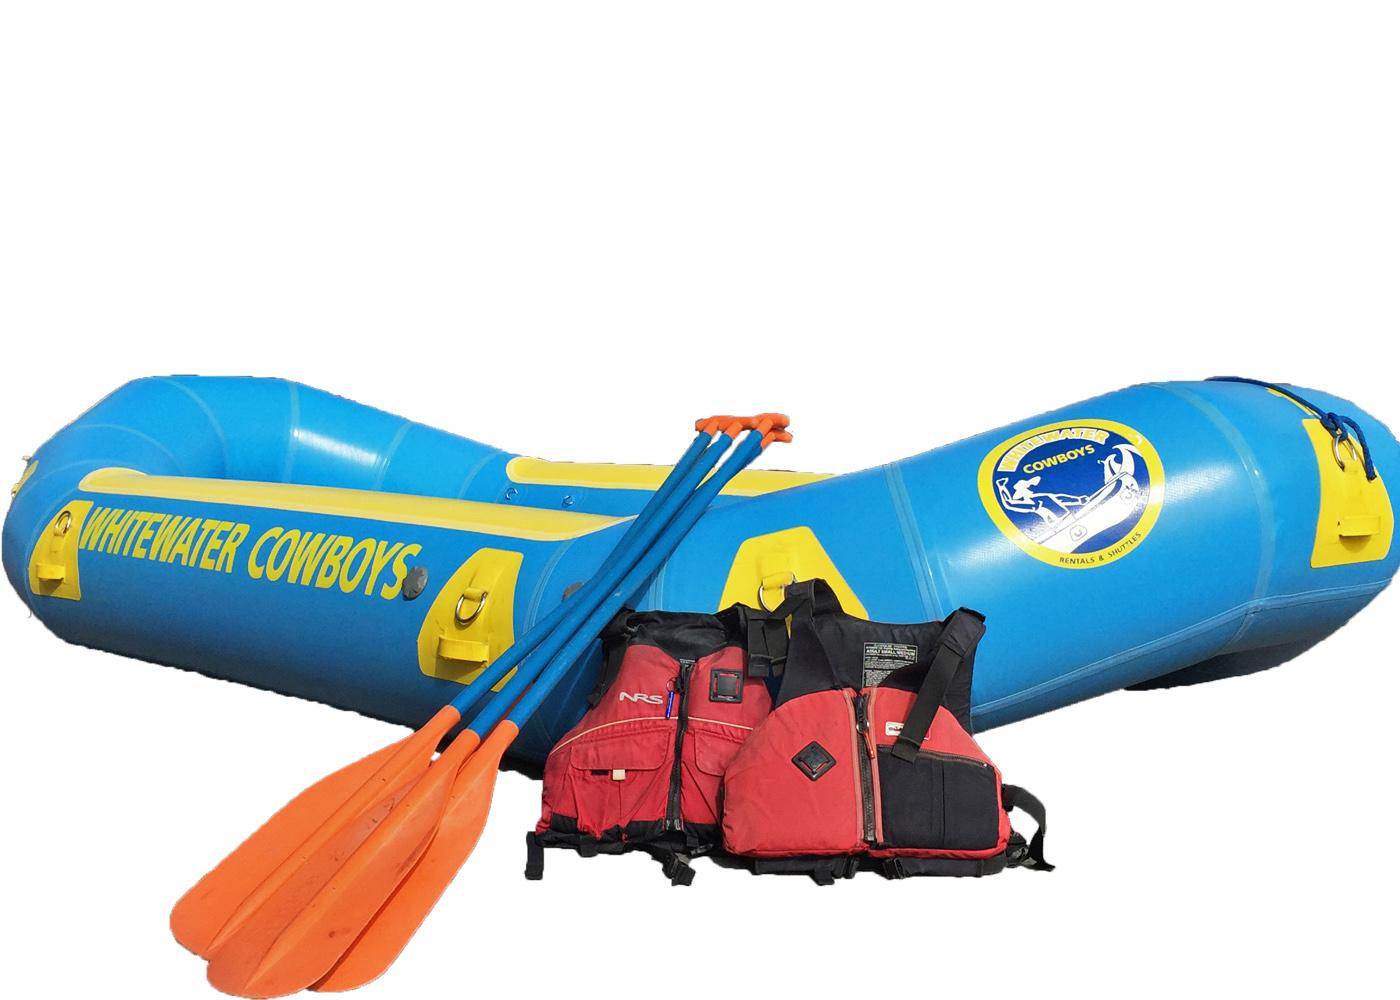 14-paddle.jpg